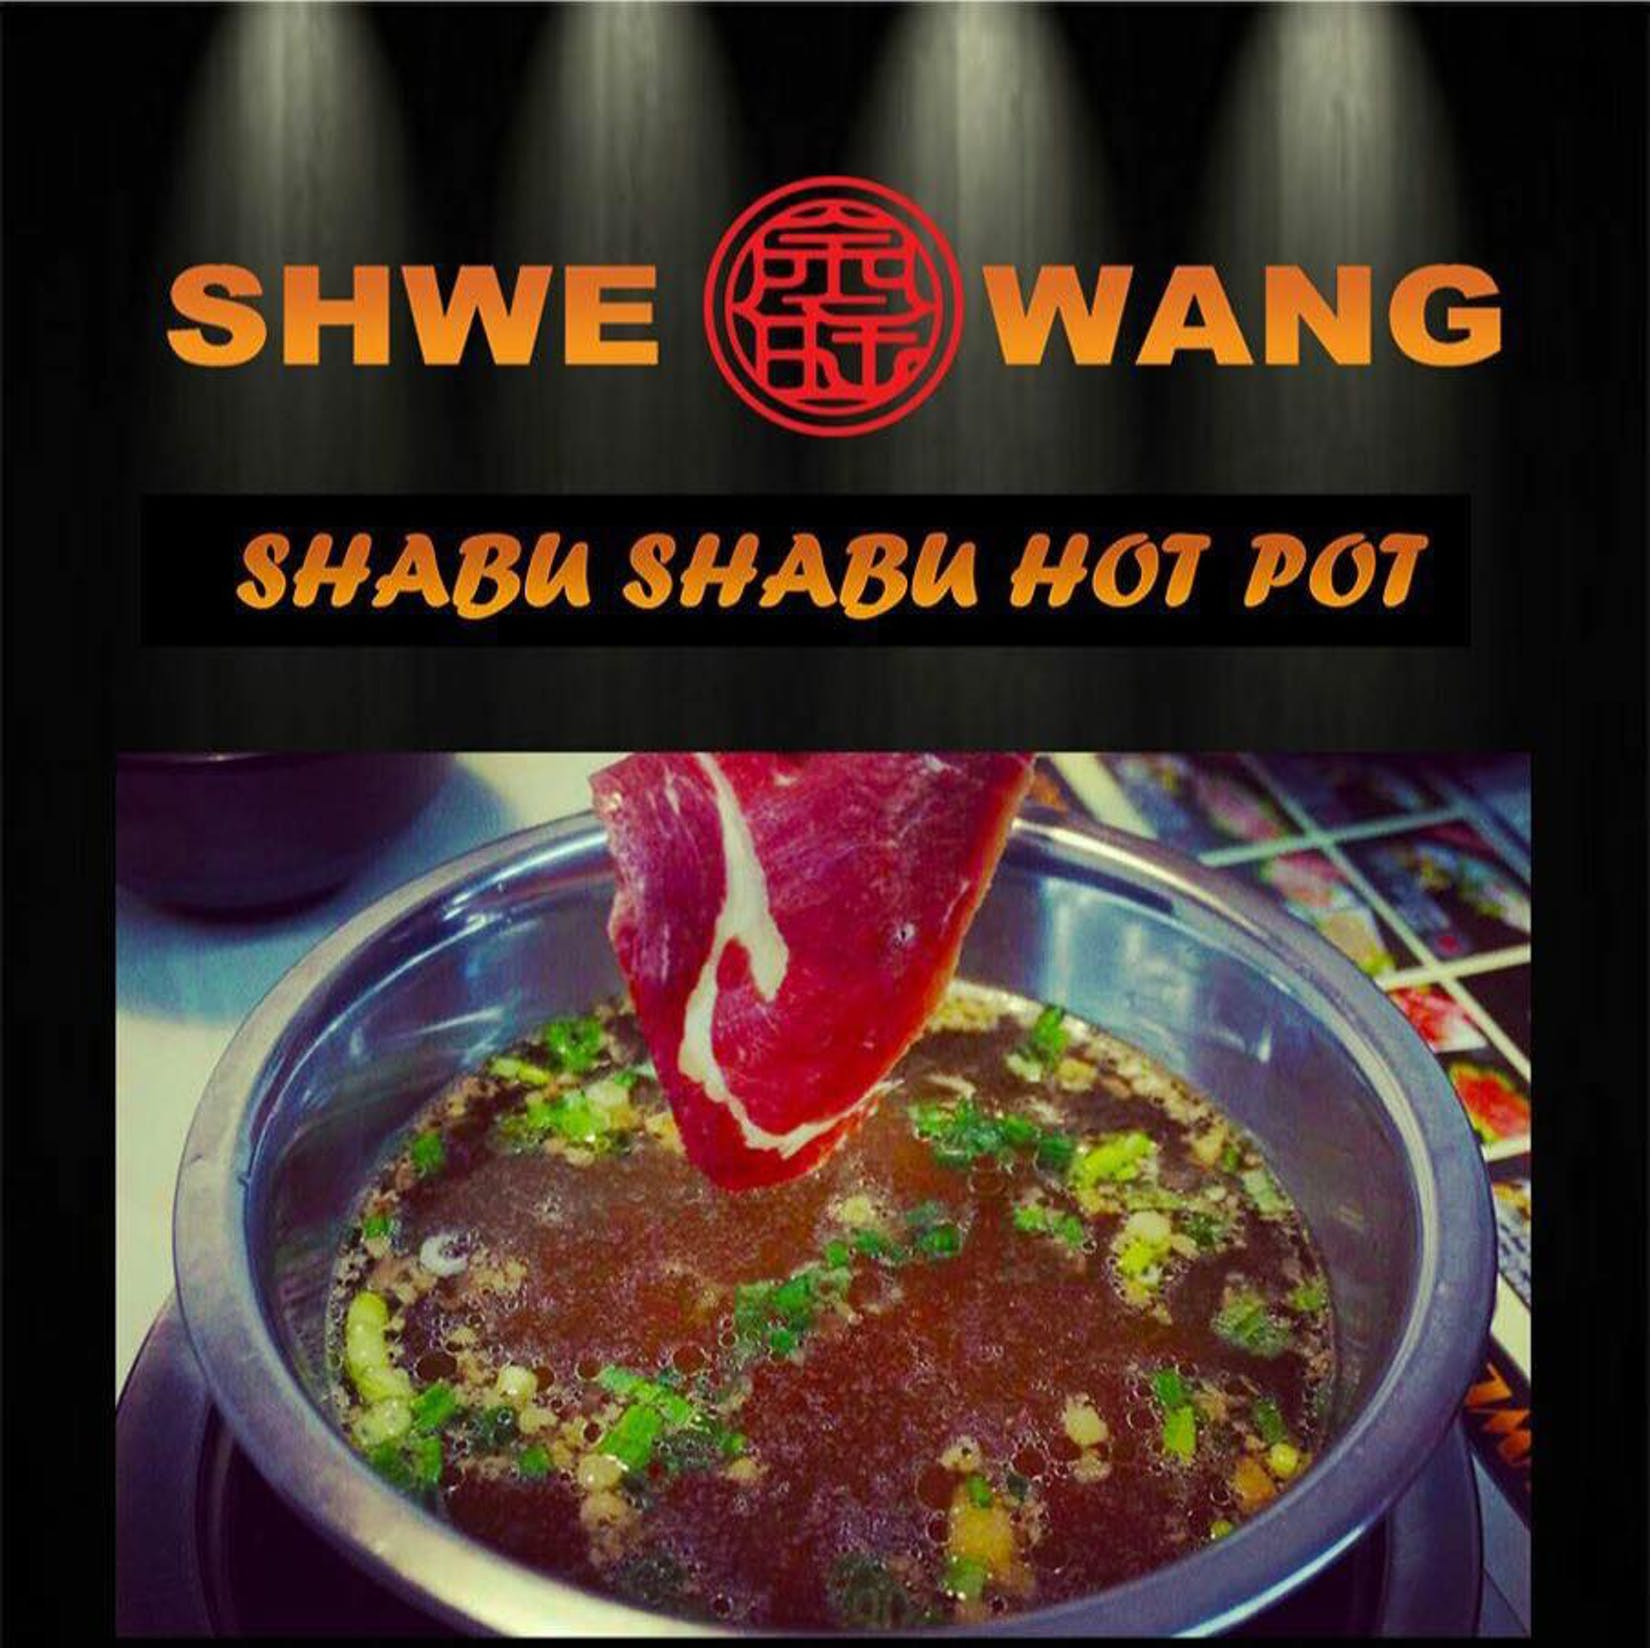 Shwe Wang Hot Pot | yathar